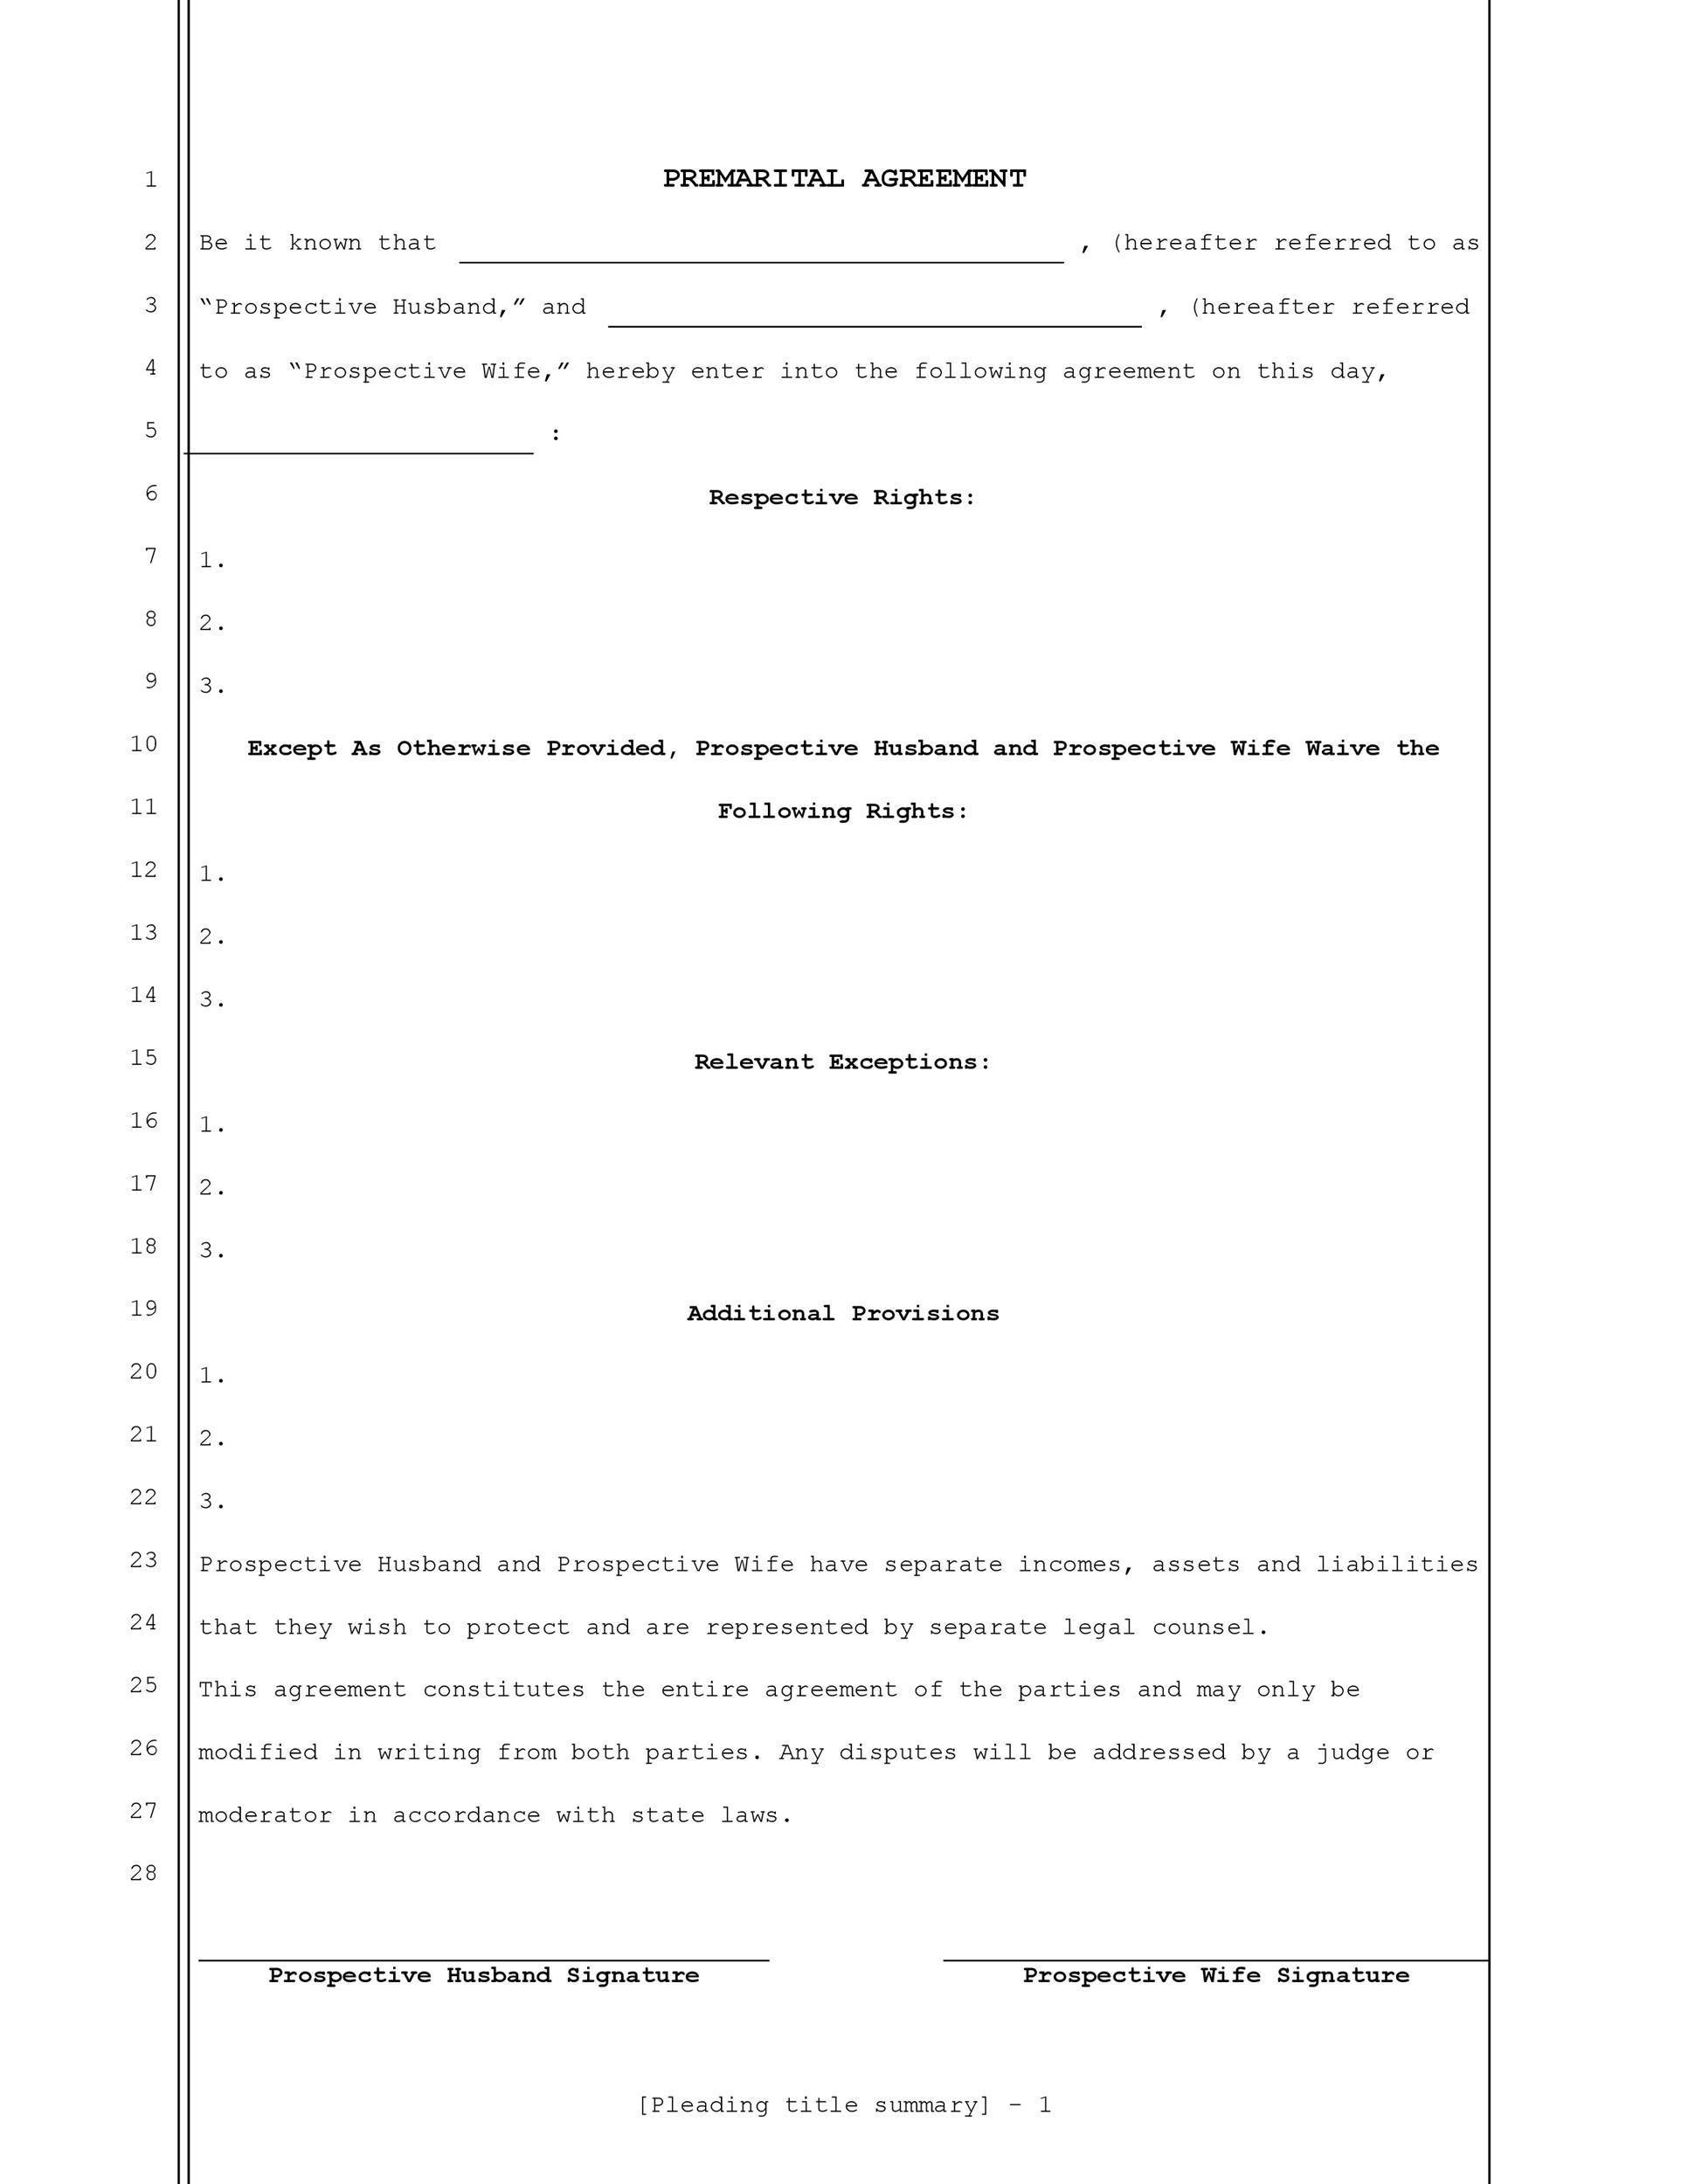 Free Prenuptial Agreement Template 11